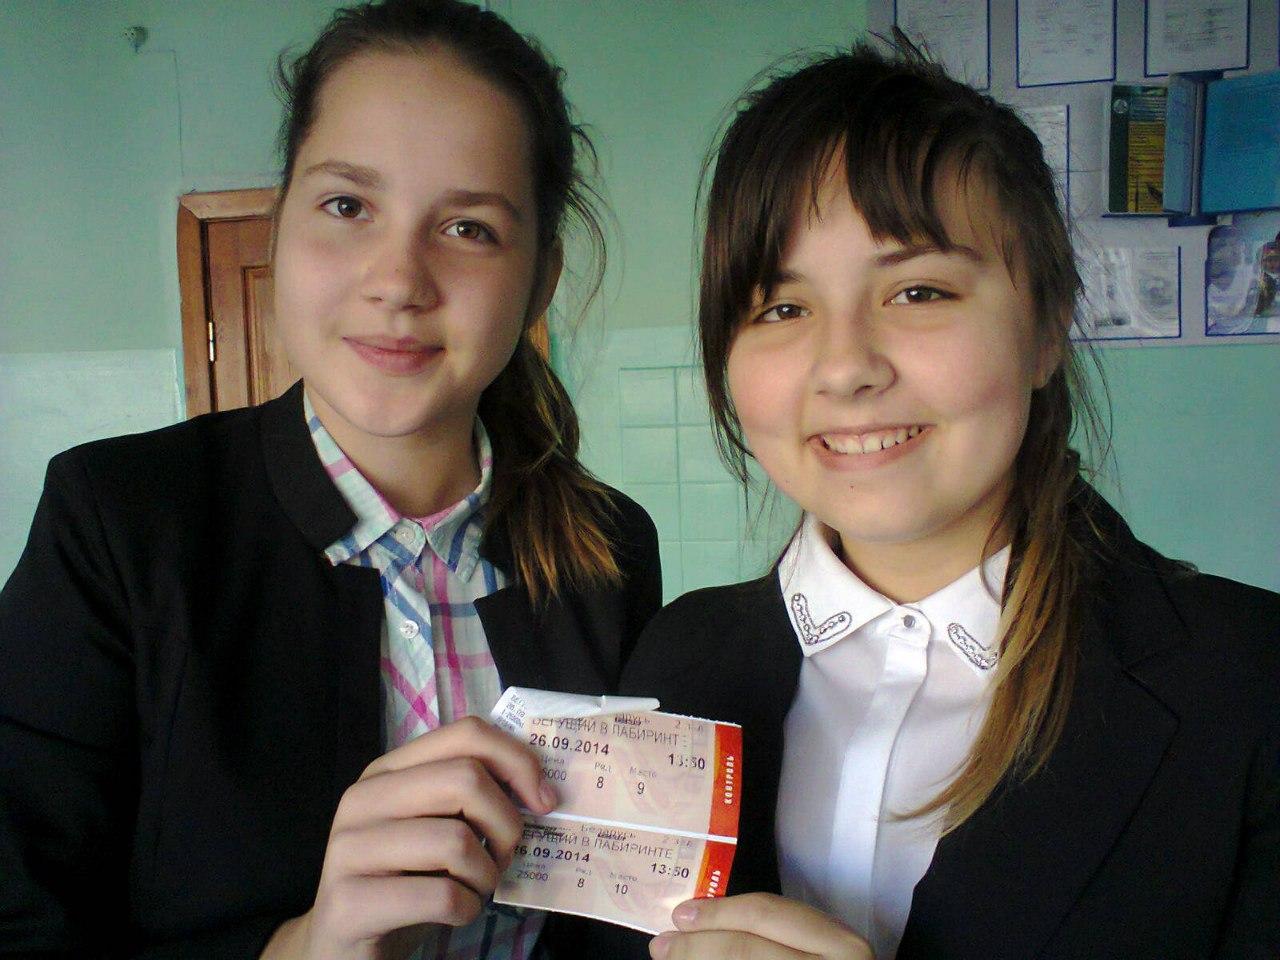 фото Владиславы Пелогейчик и Александры Каленик